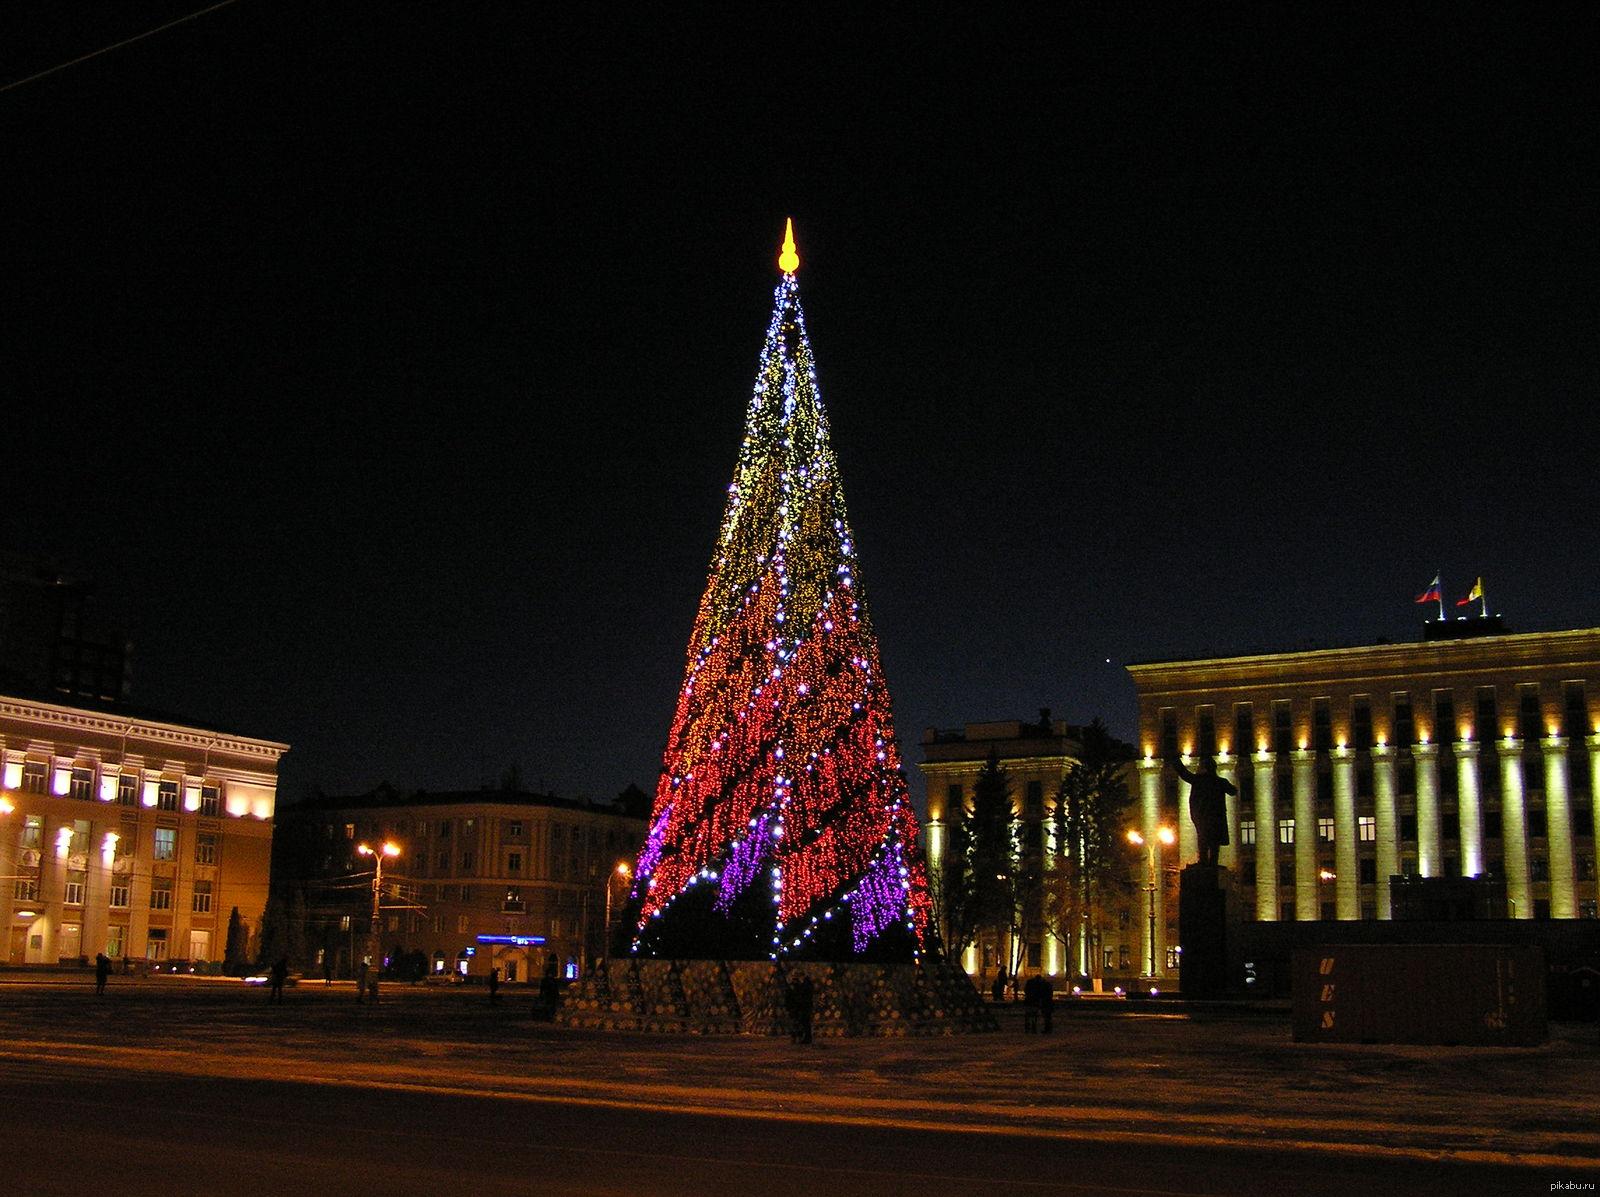 Фото новогодней елки 2012 воронеж 3